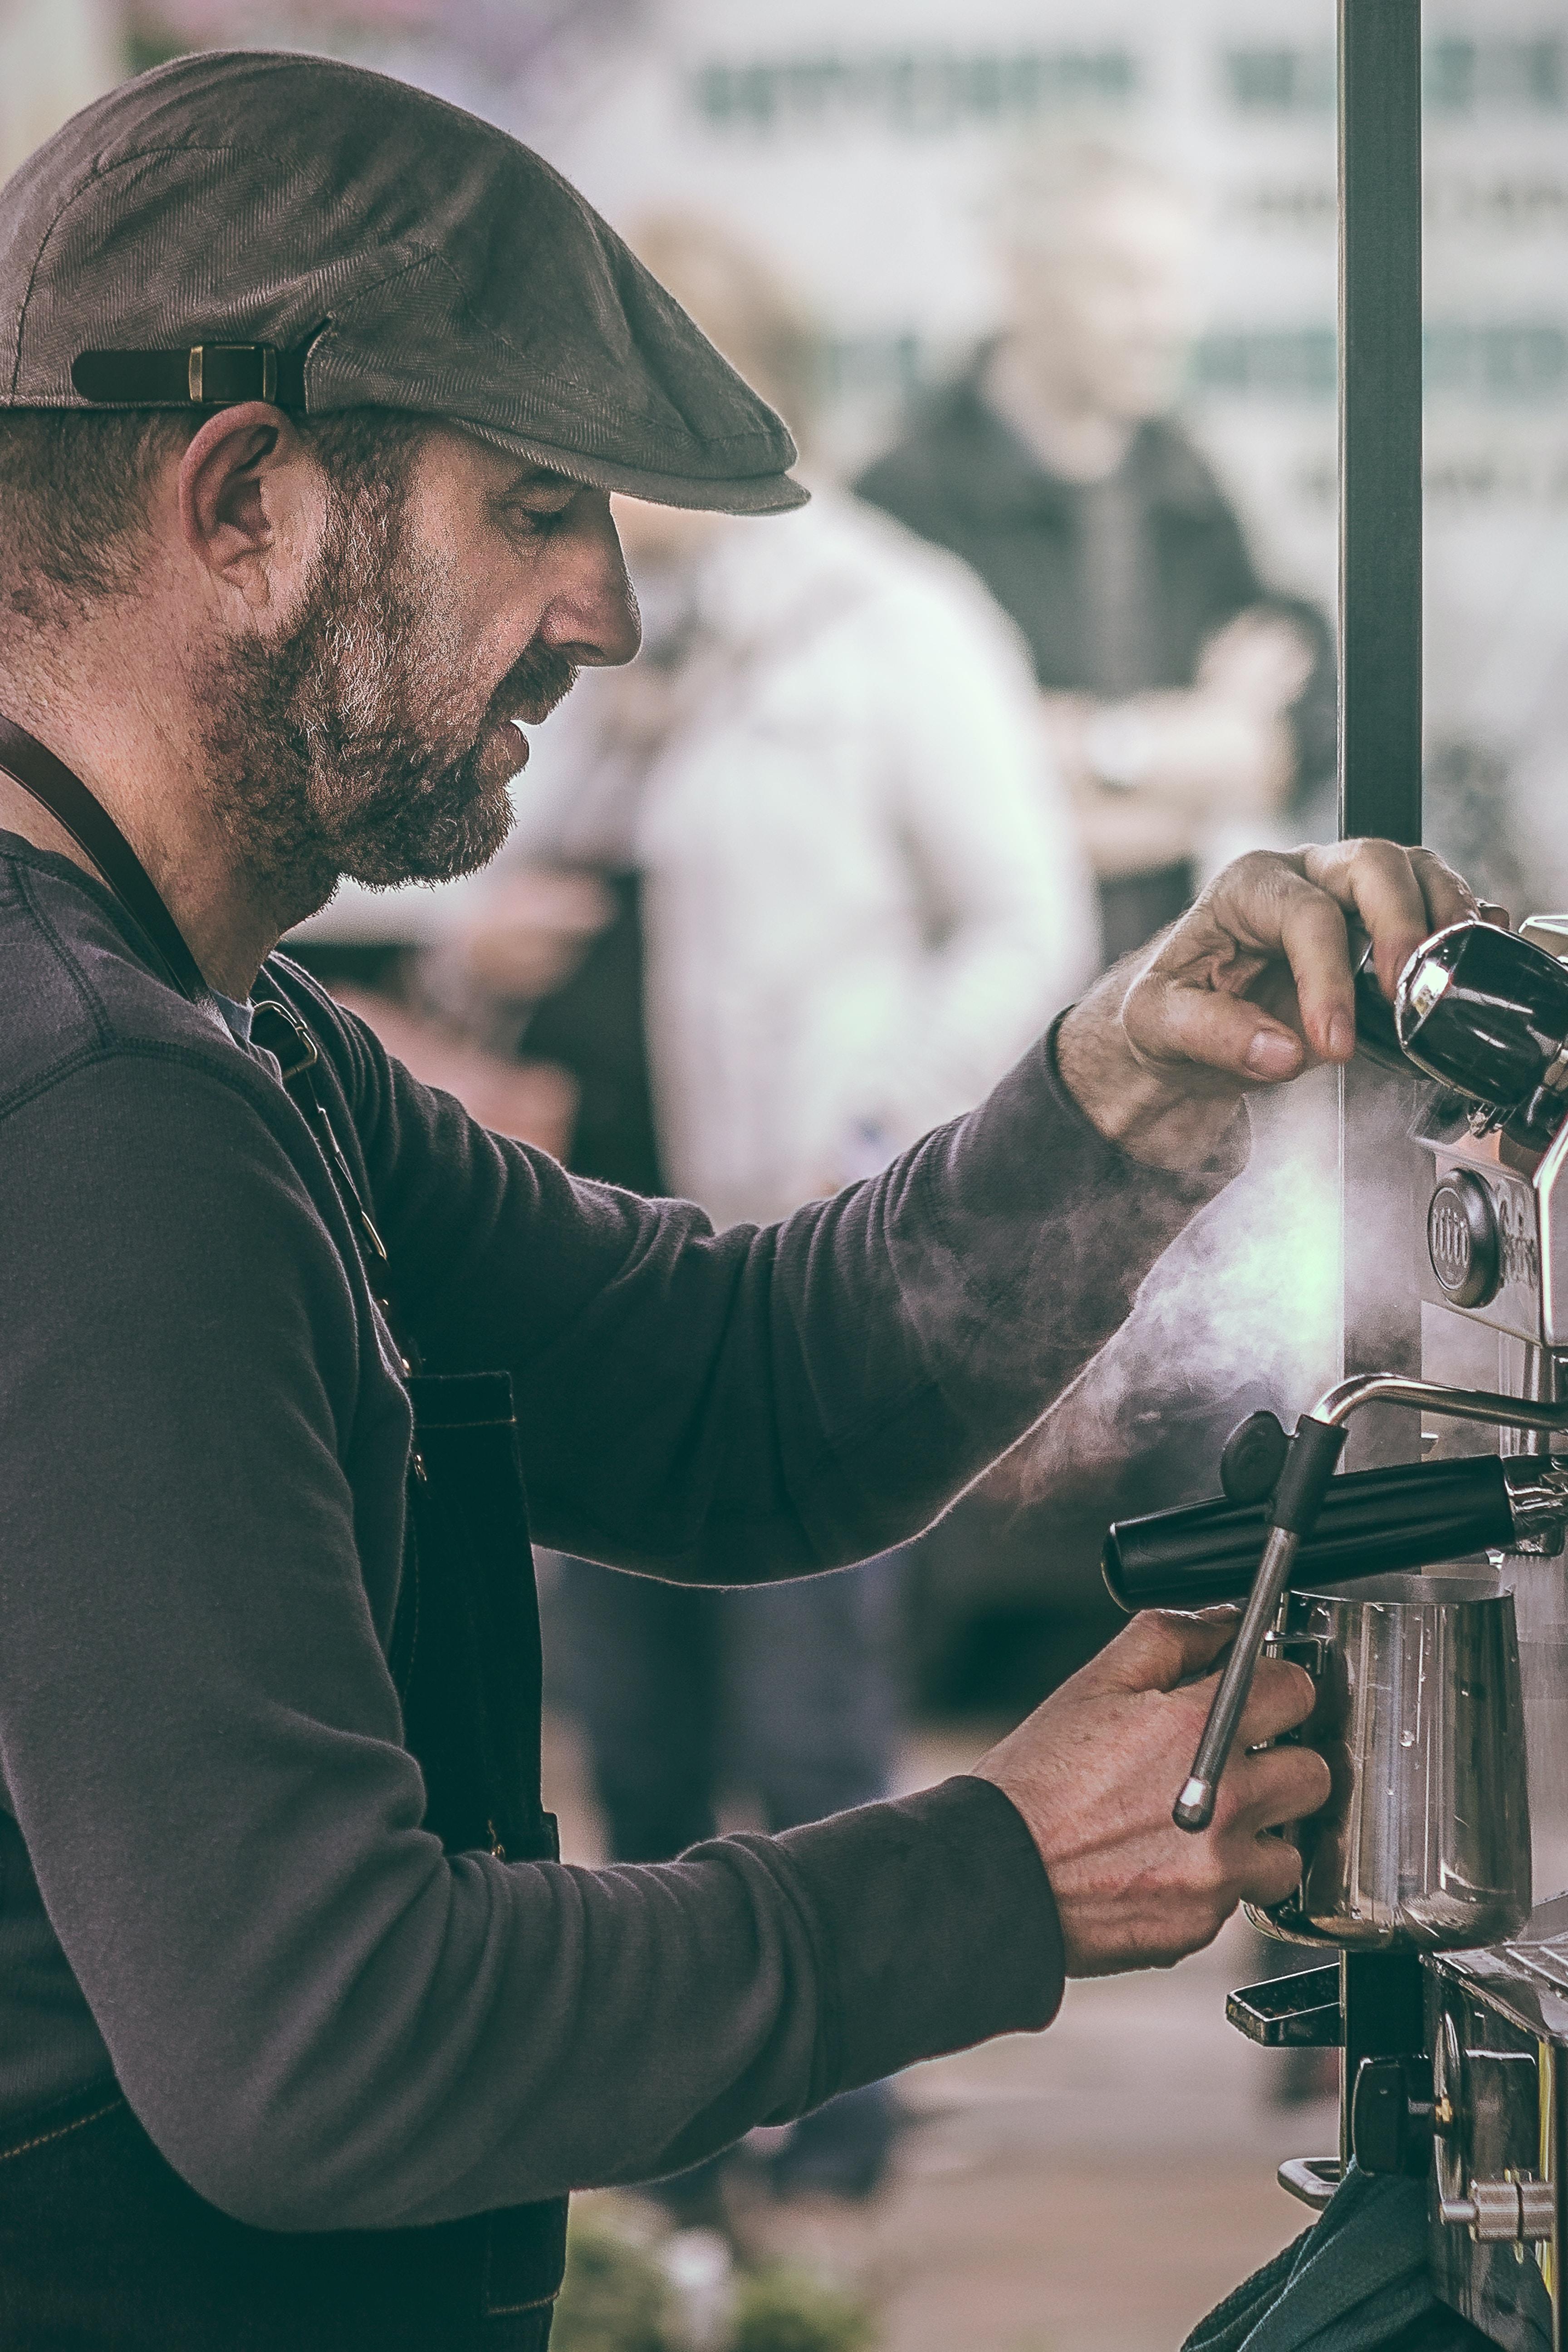 man operating espresso machine